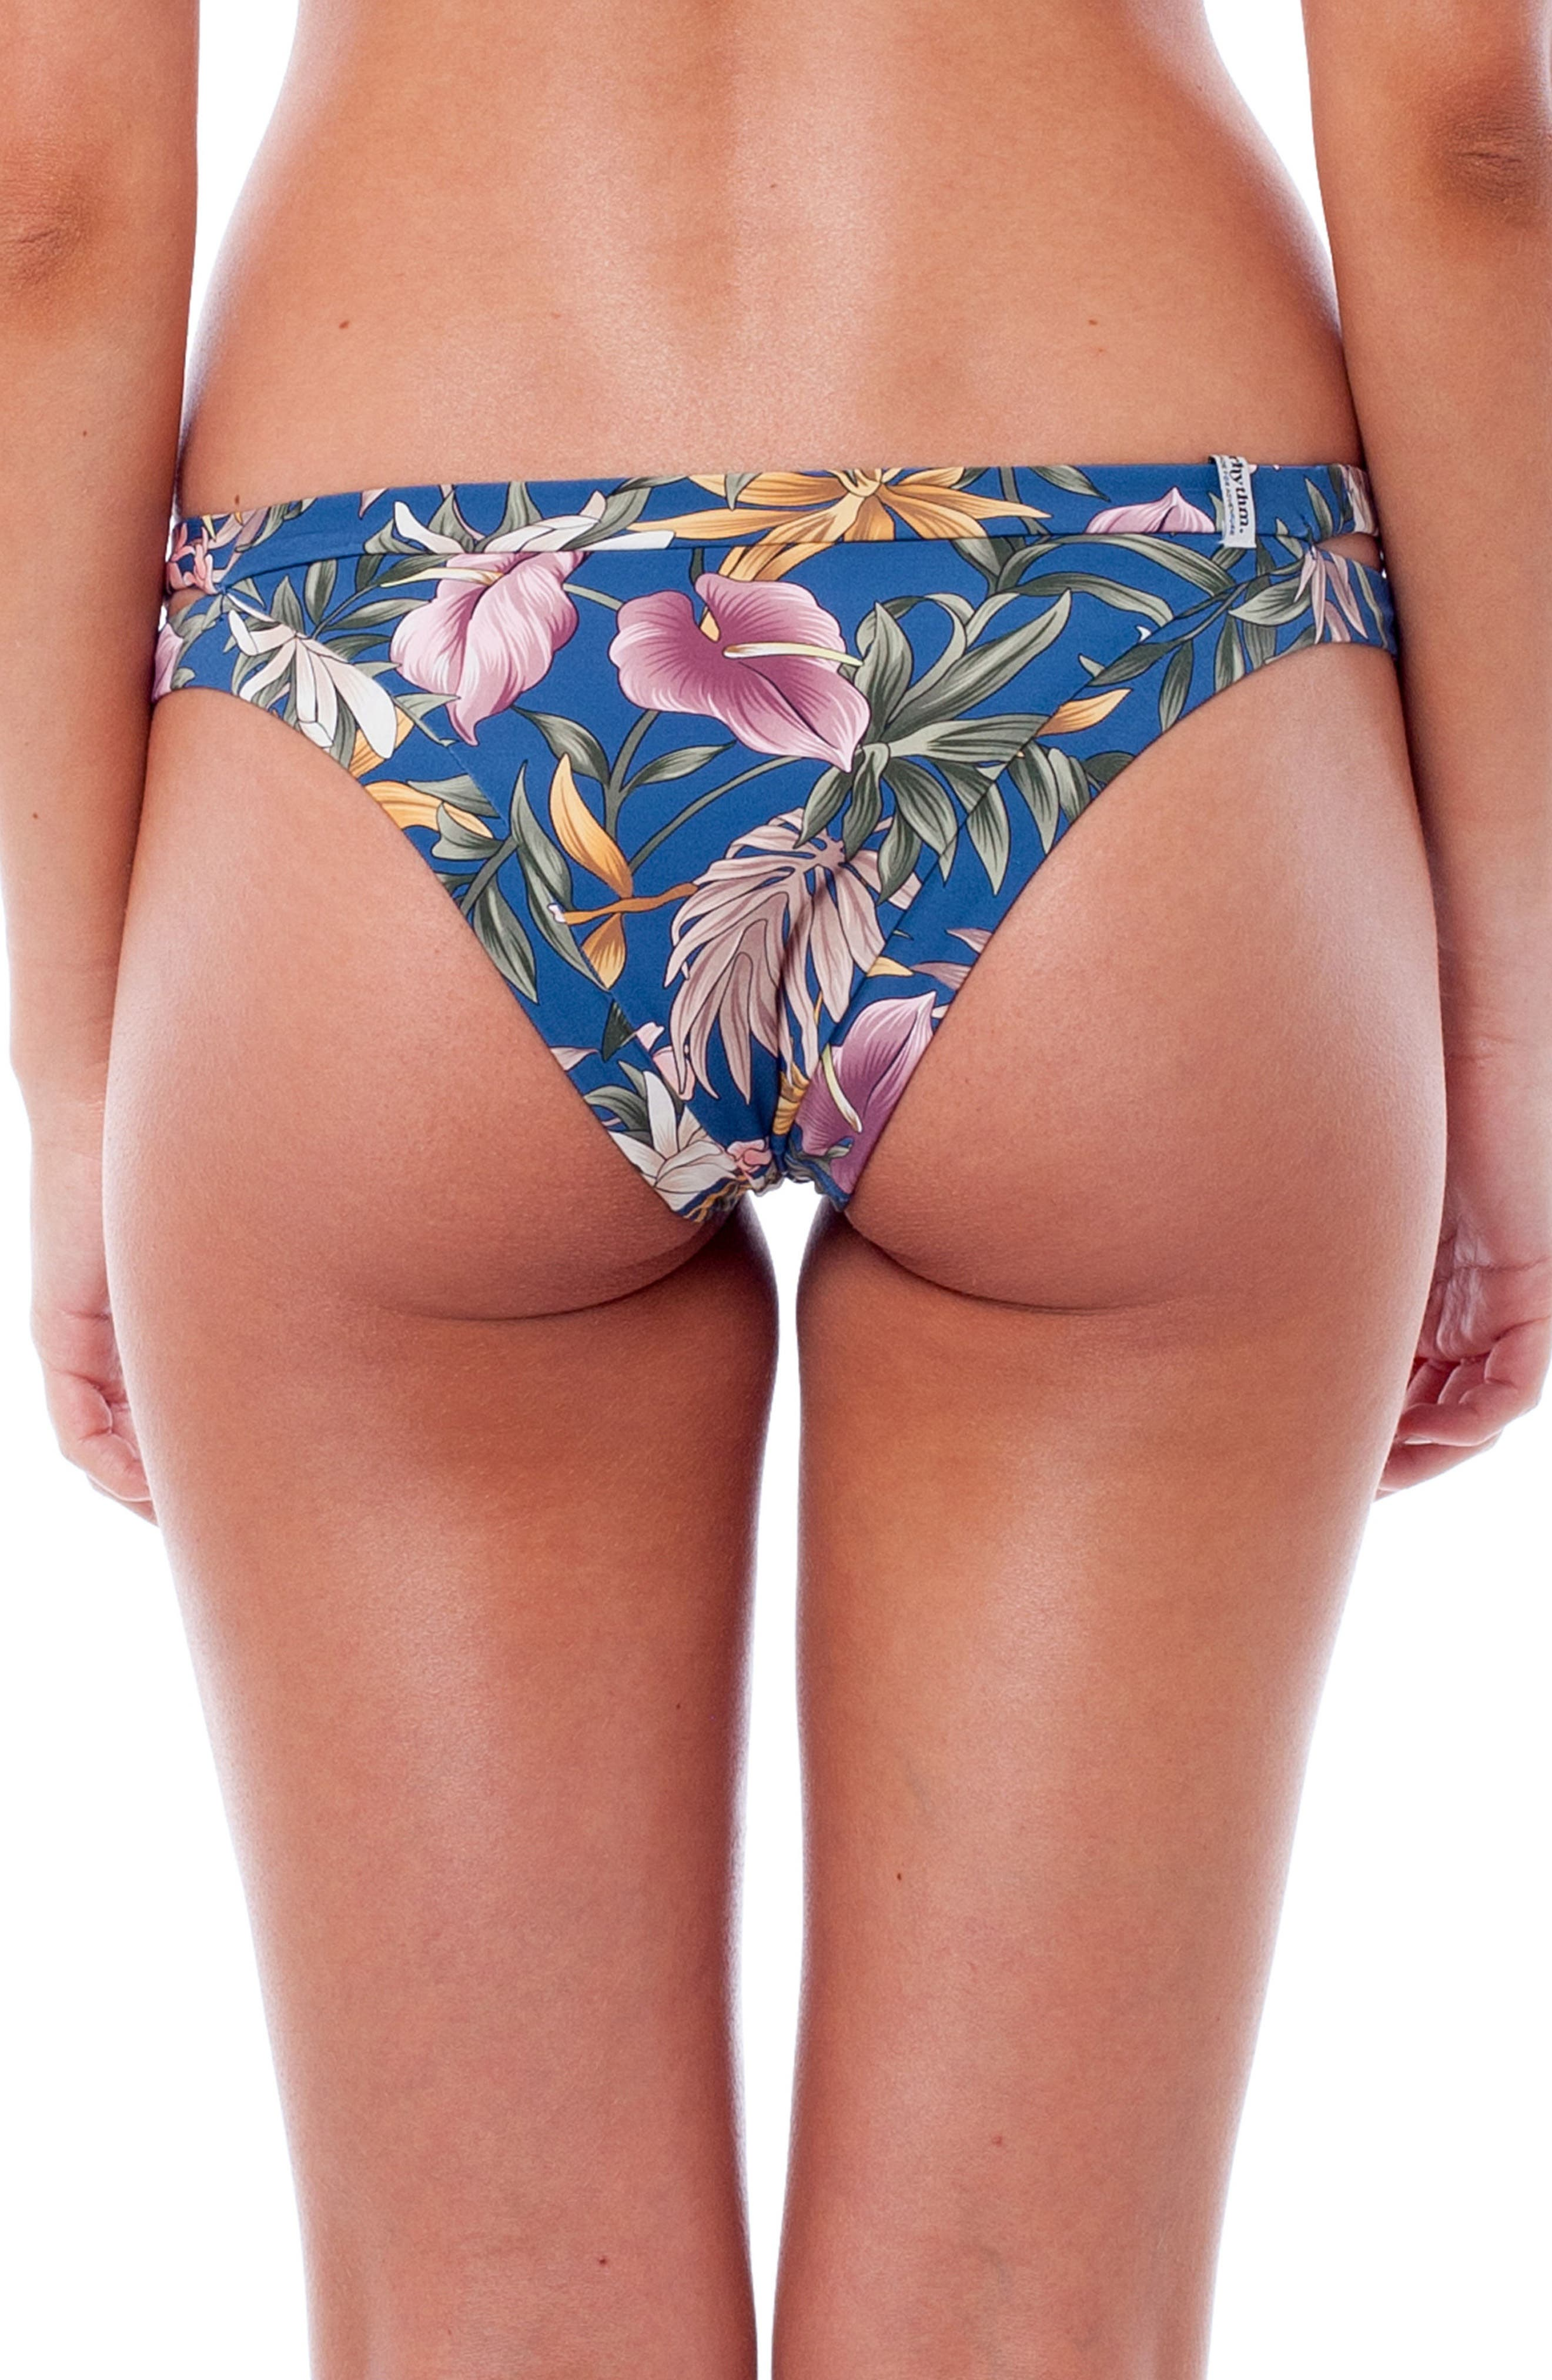 Bermuda Itsy Bikini Bottoms,                             Alternate thumbnail 2, color,                             Sea